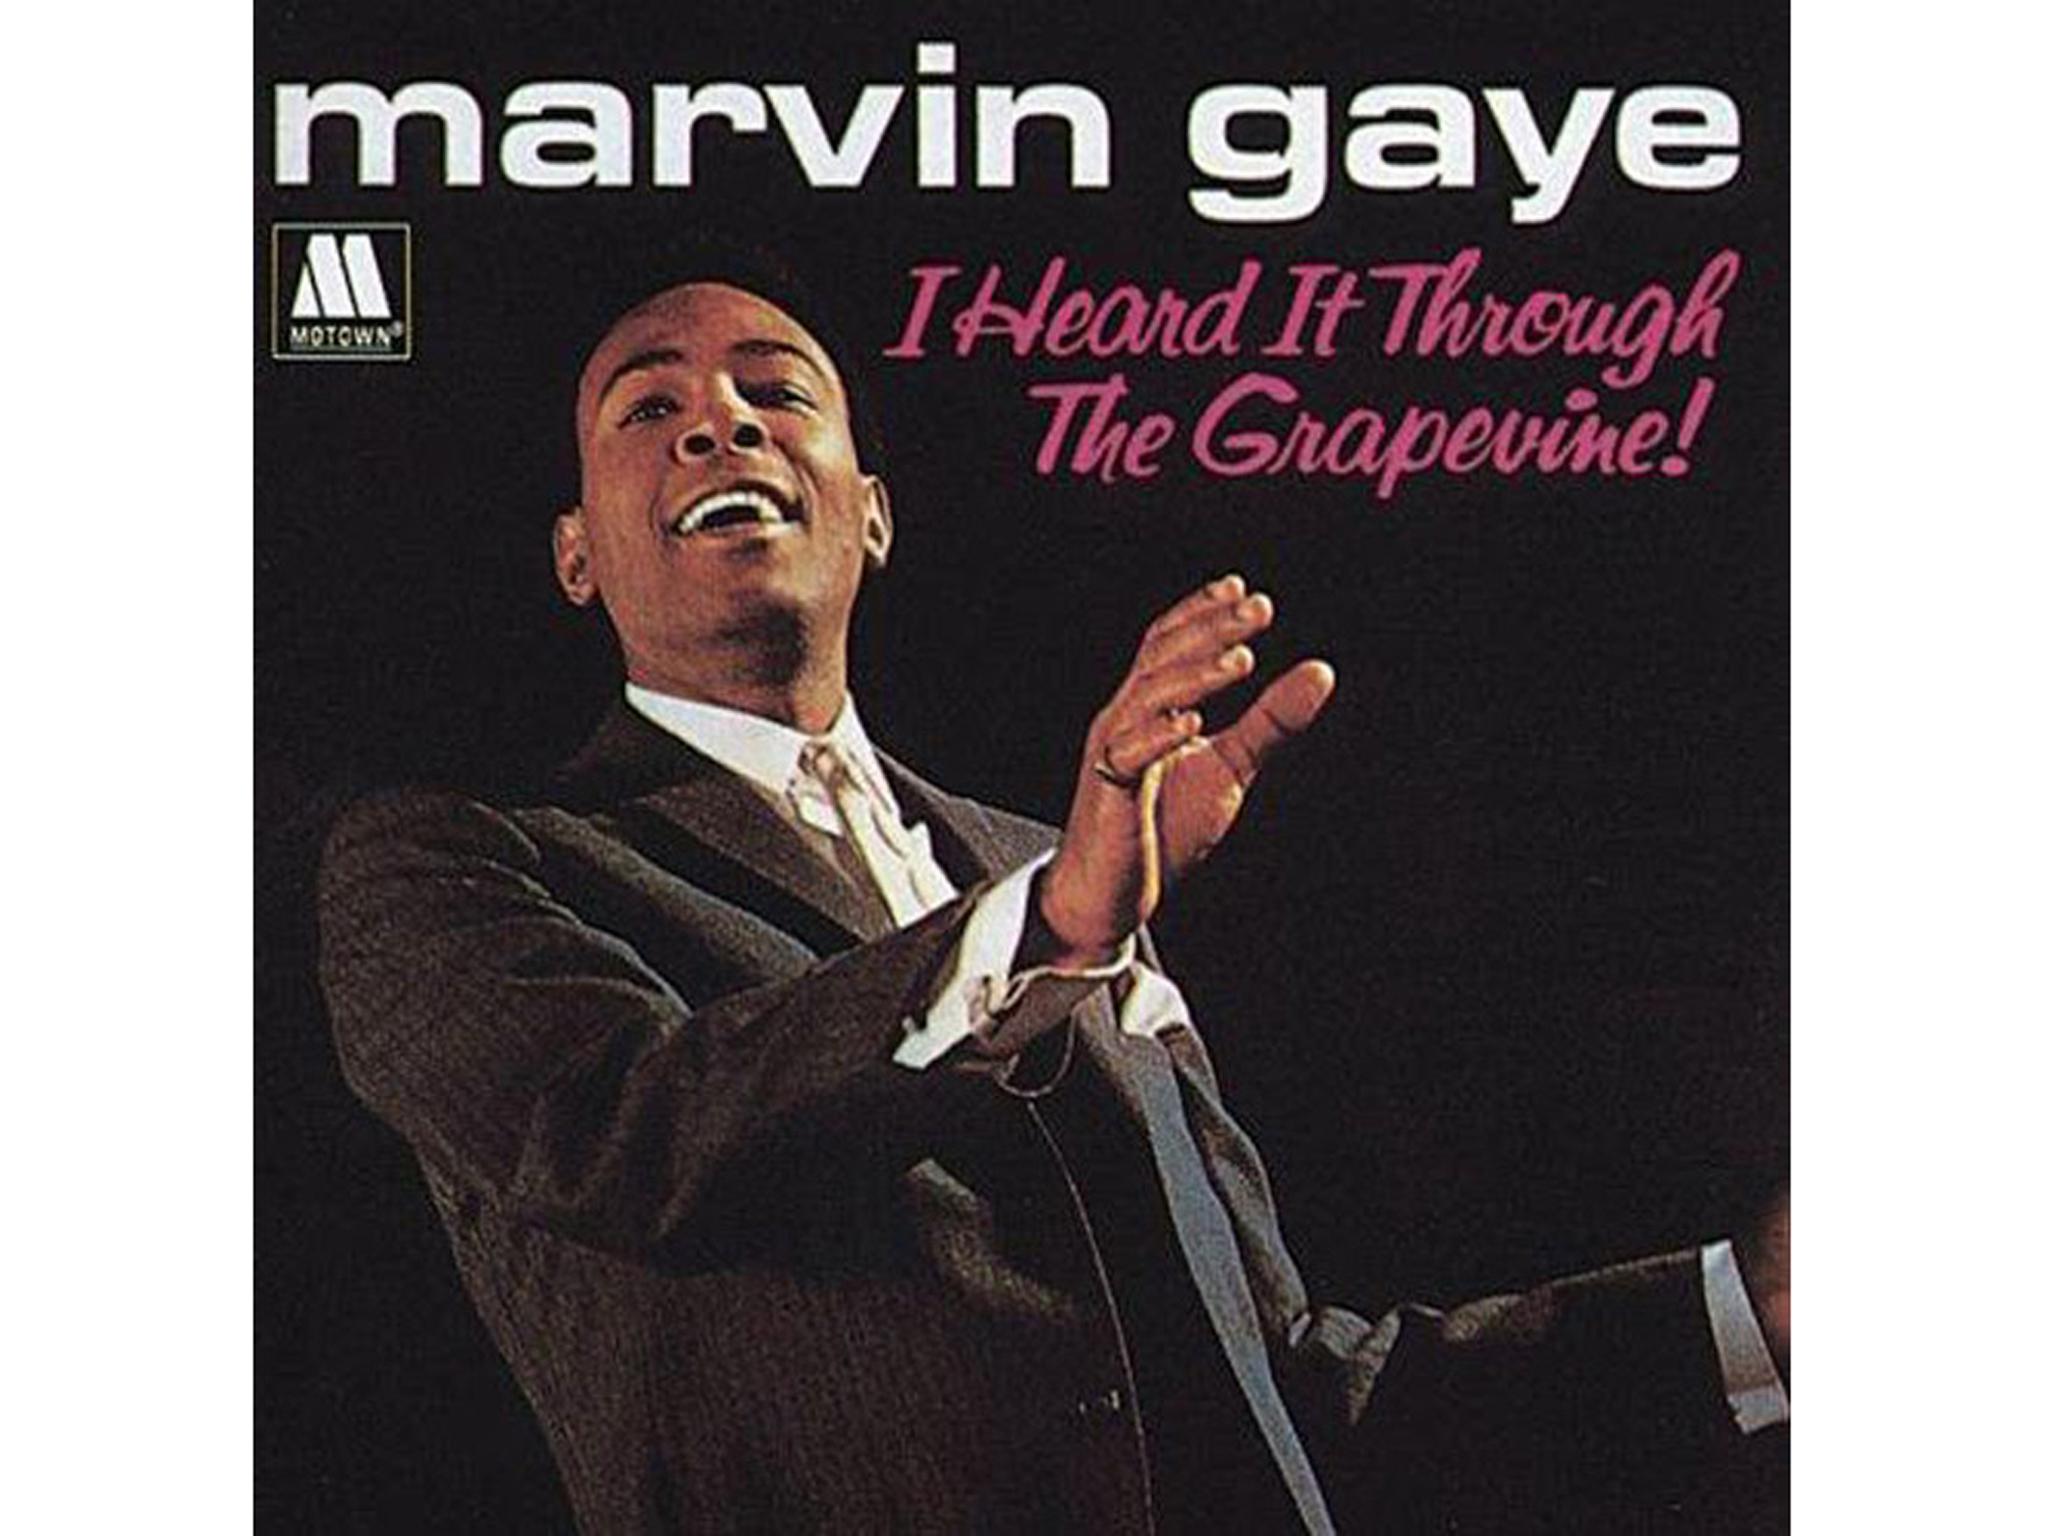 'I Heard It Through the Grapevine' – Marvin Gaye